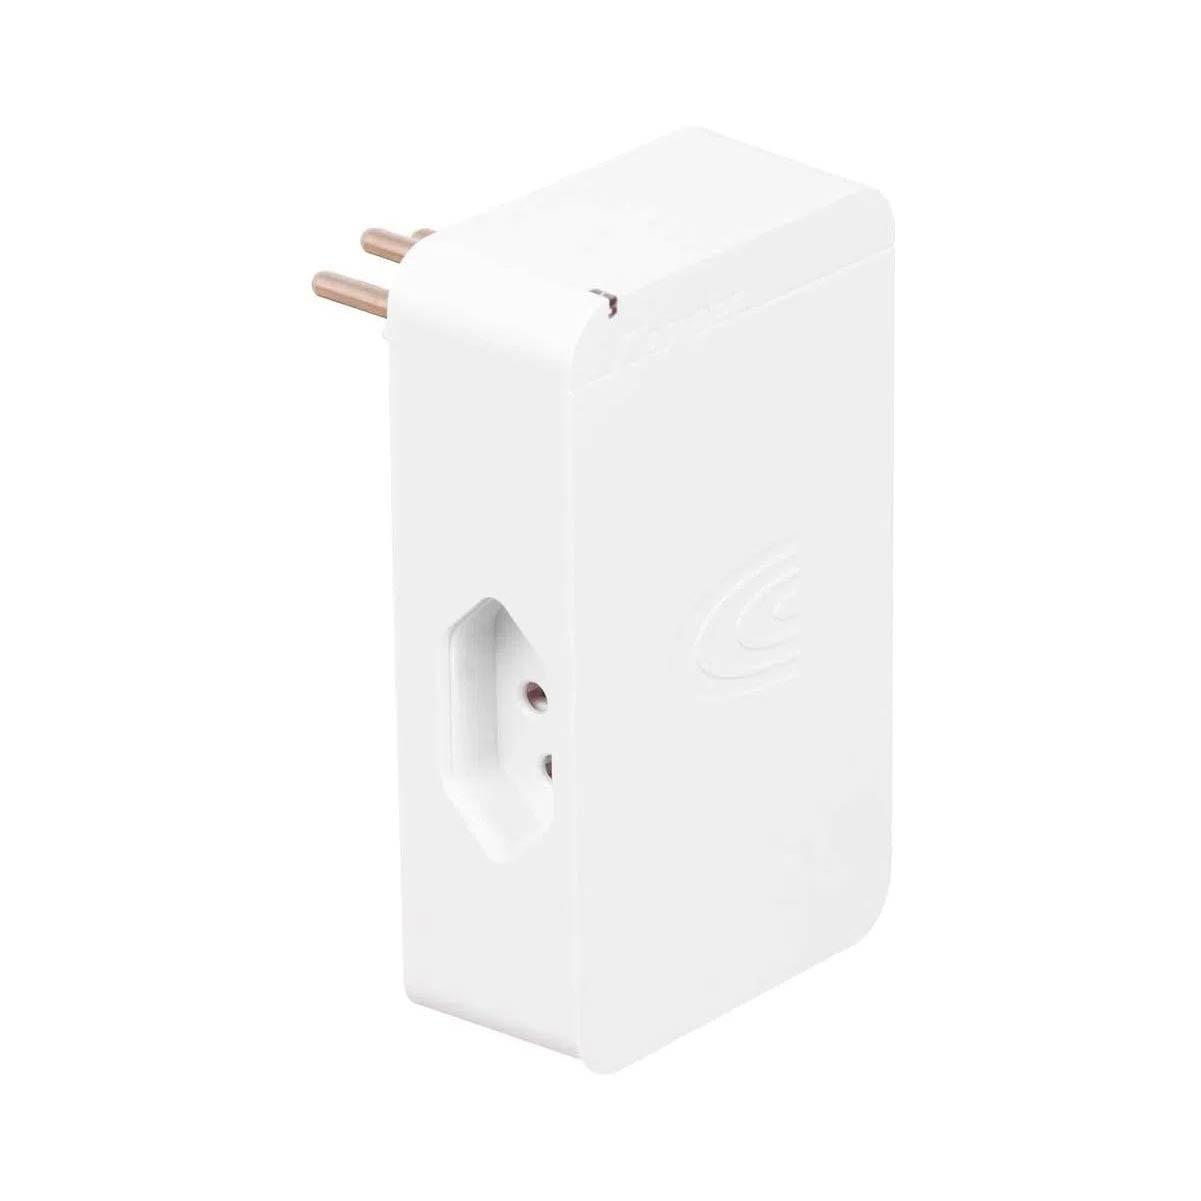 Filtro de Linha iClamper Energia 3 Protetor Contra Surtos e Raios Branco